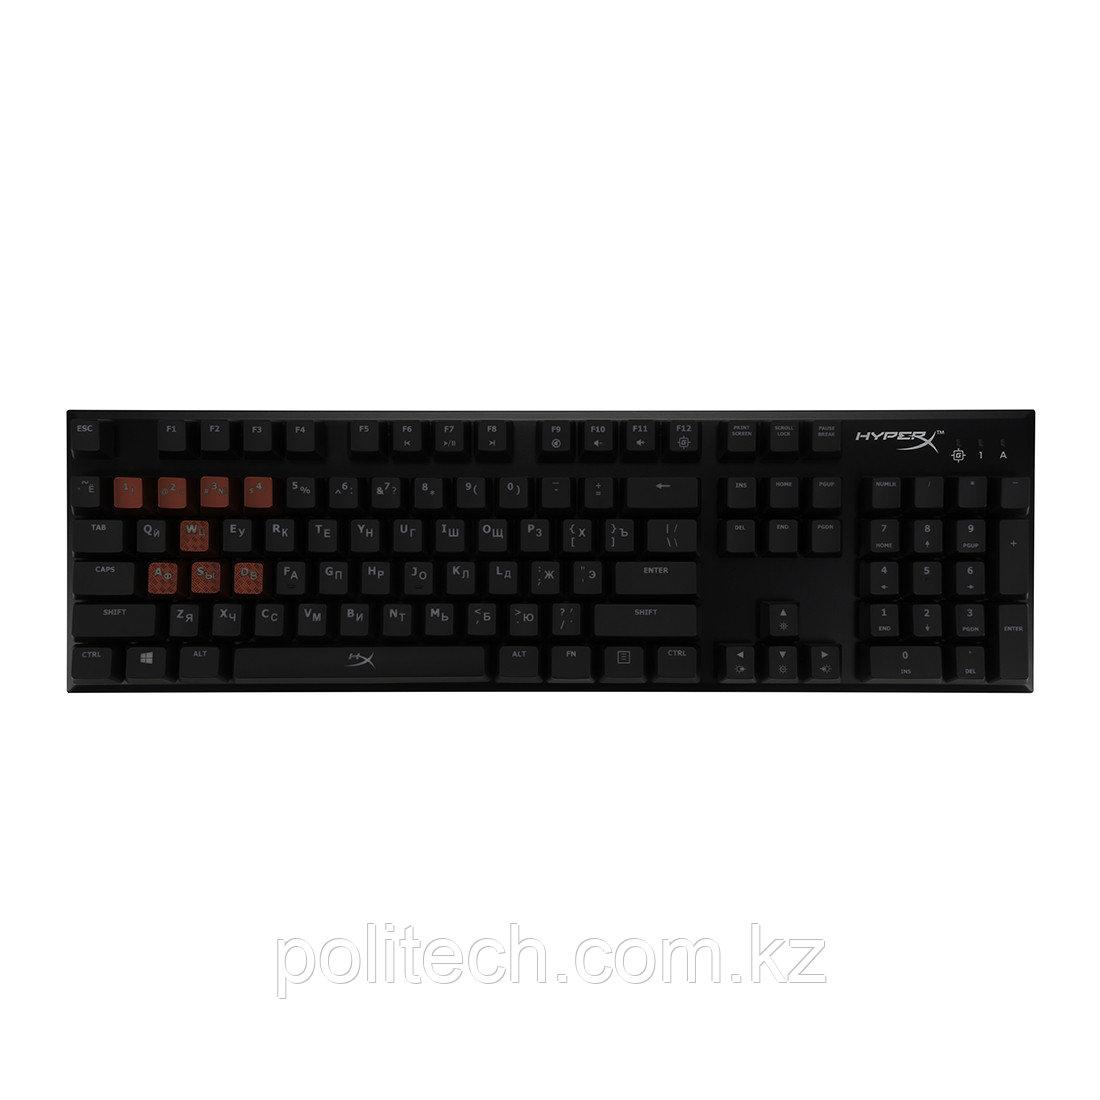 Клавиатура HyperX Alloy FPS Mechanical Gaming MX Blue HX-KB1BL1-RU/A5